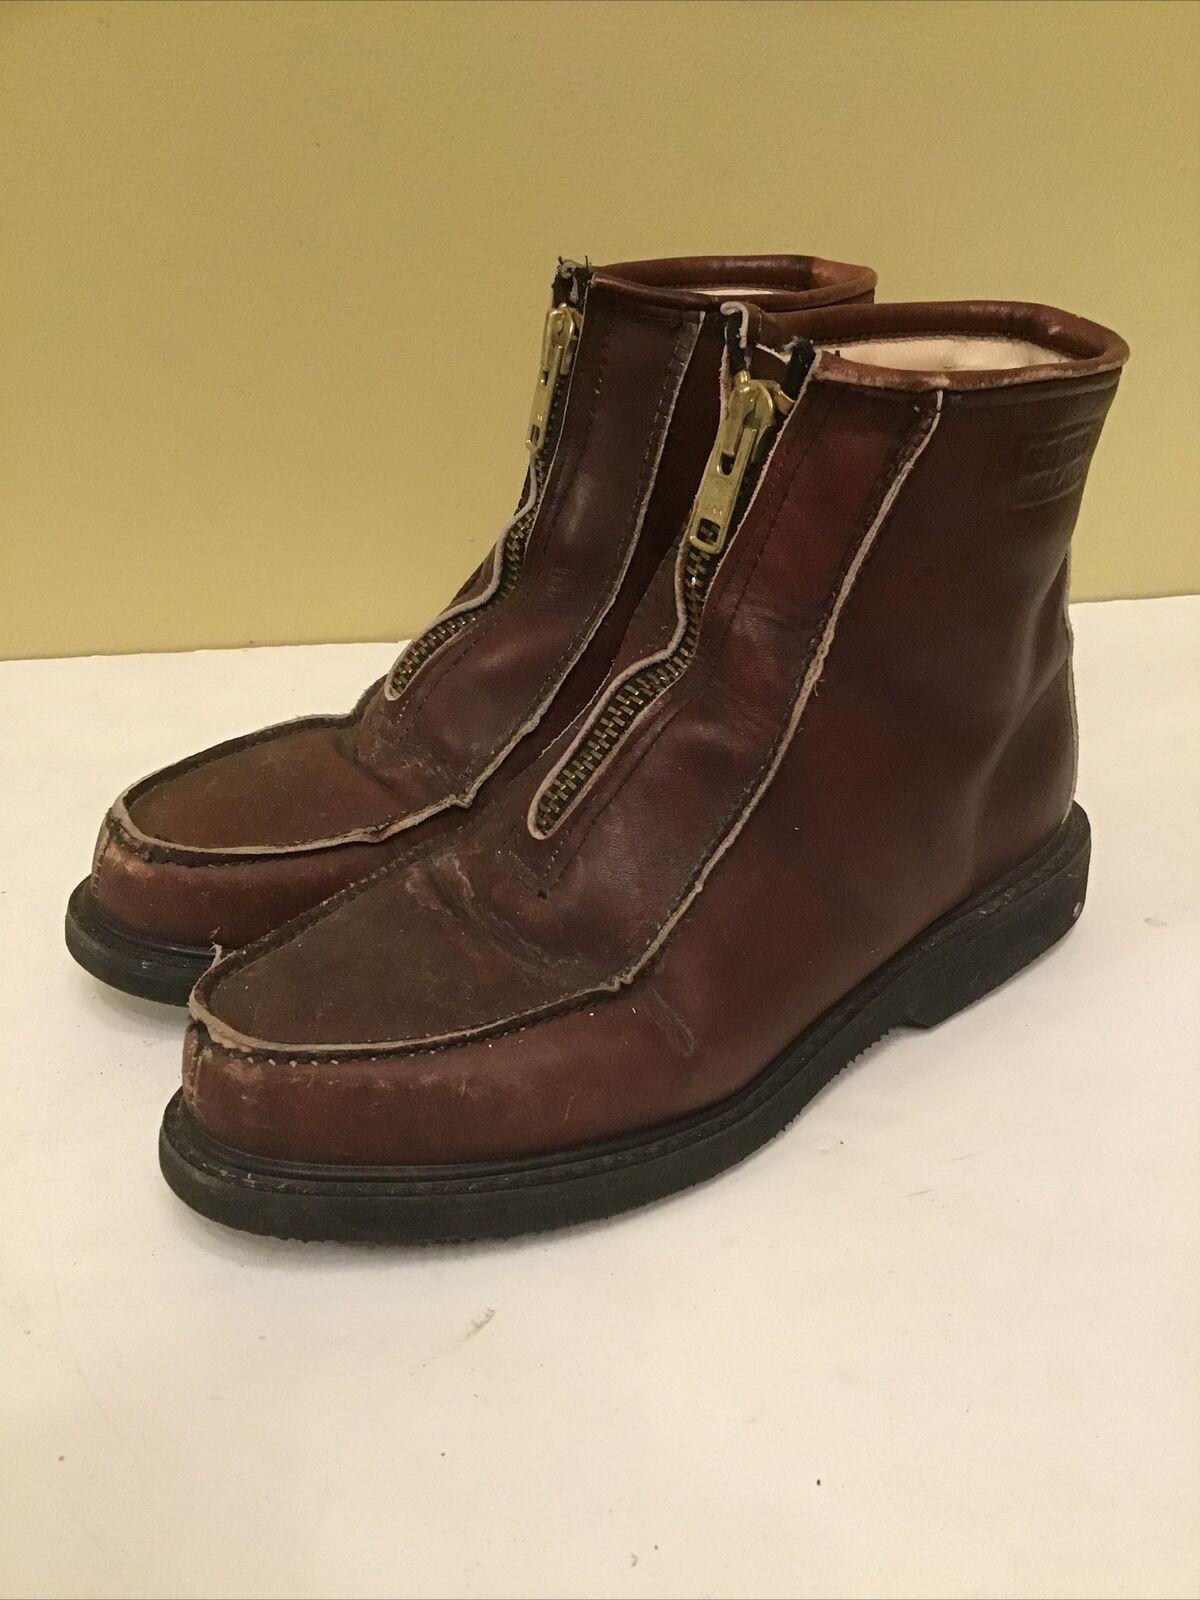 HH Double H Stadium Boots Brown Leather Sz 9D Front Zip Model subzero 5334 USA